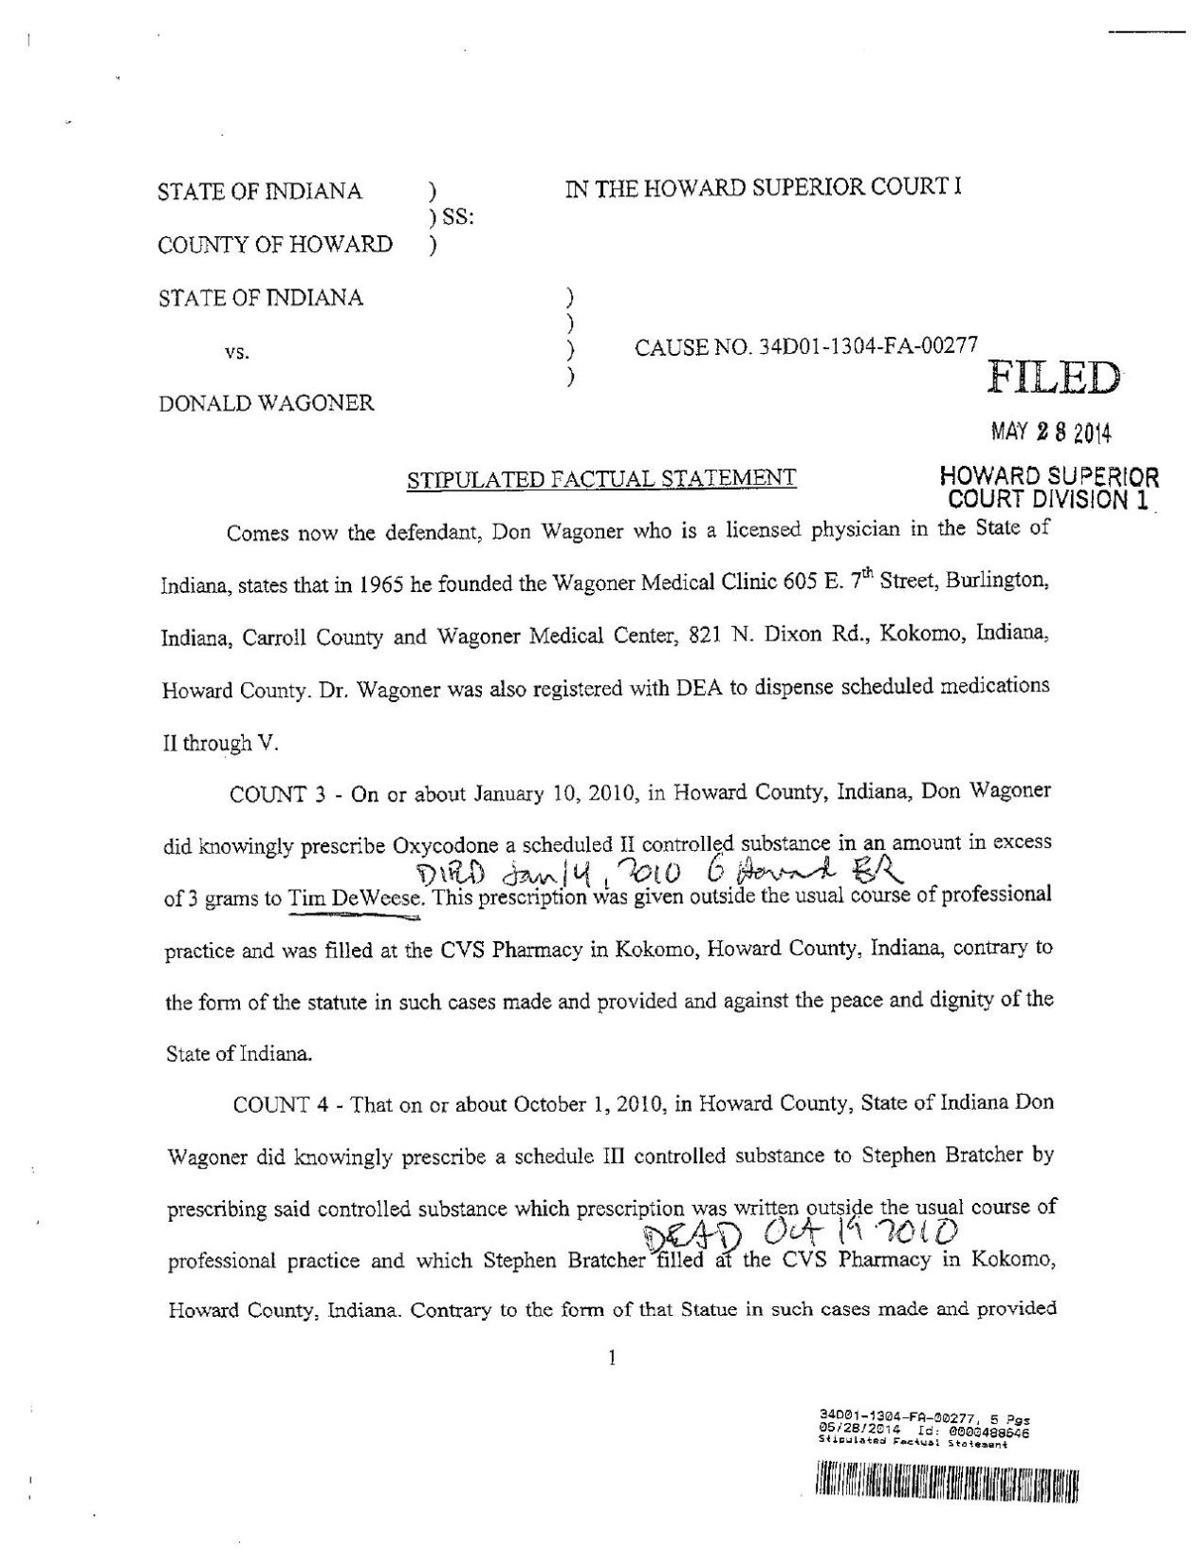 Wagoner plea and sentencing